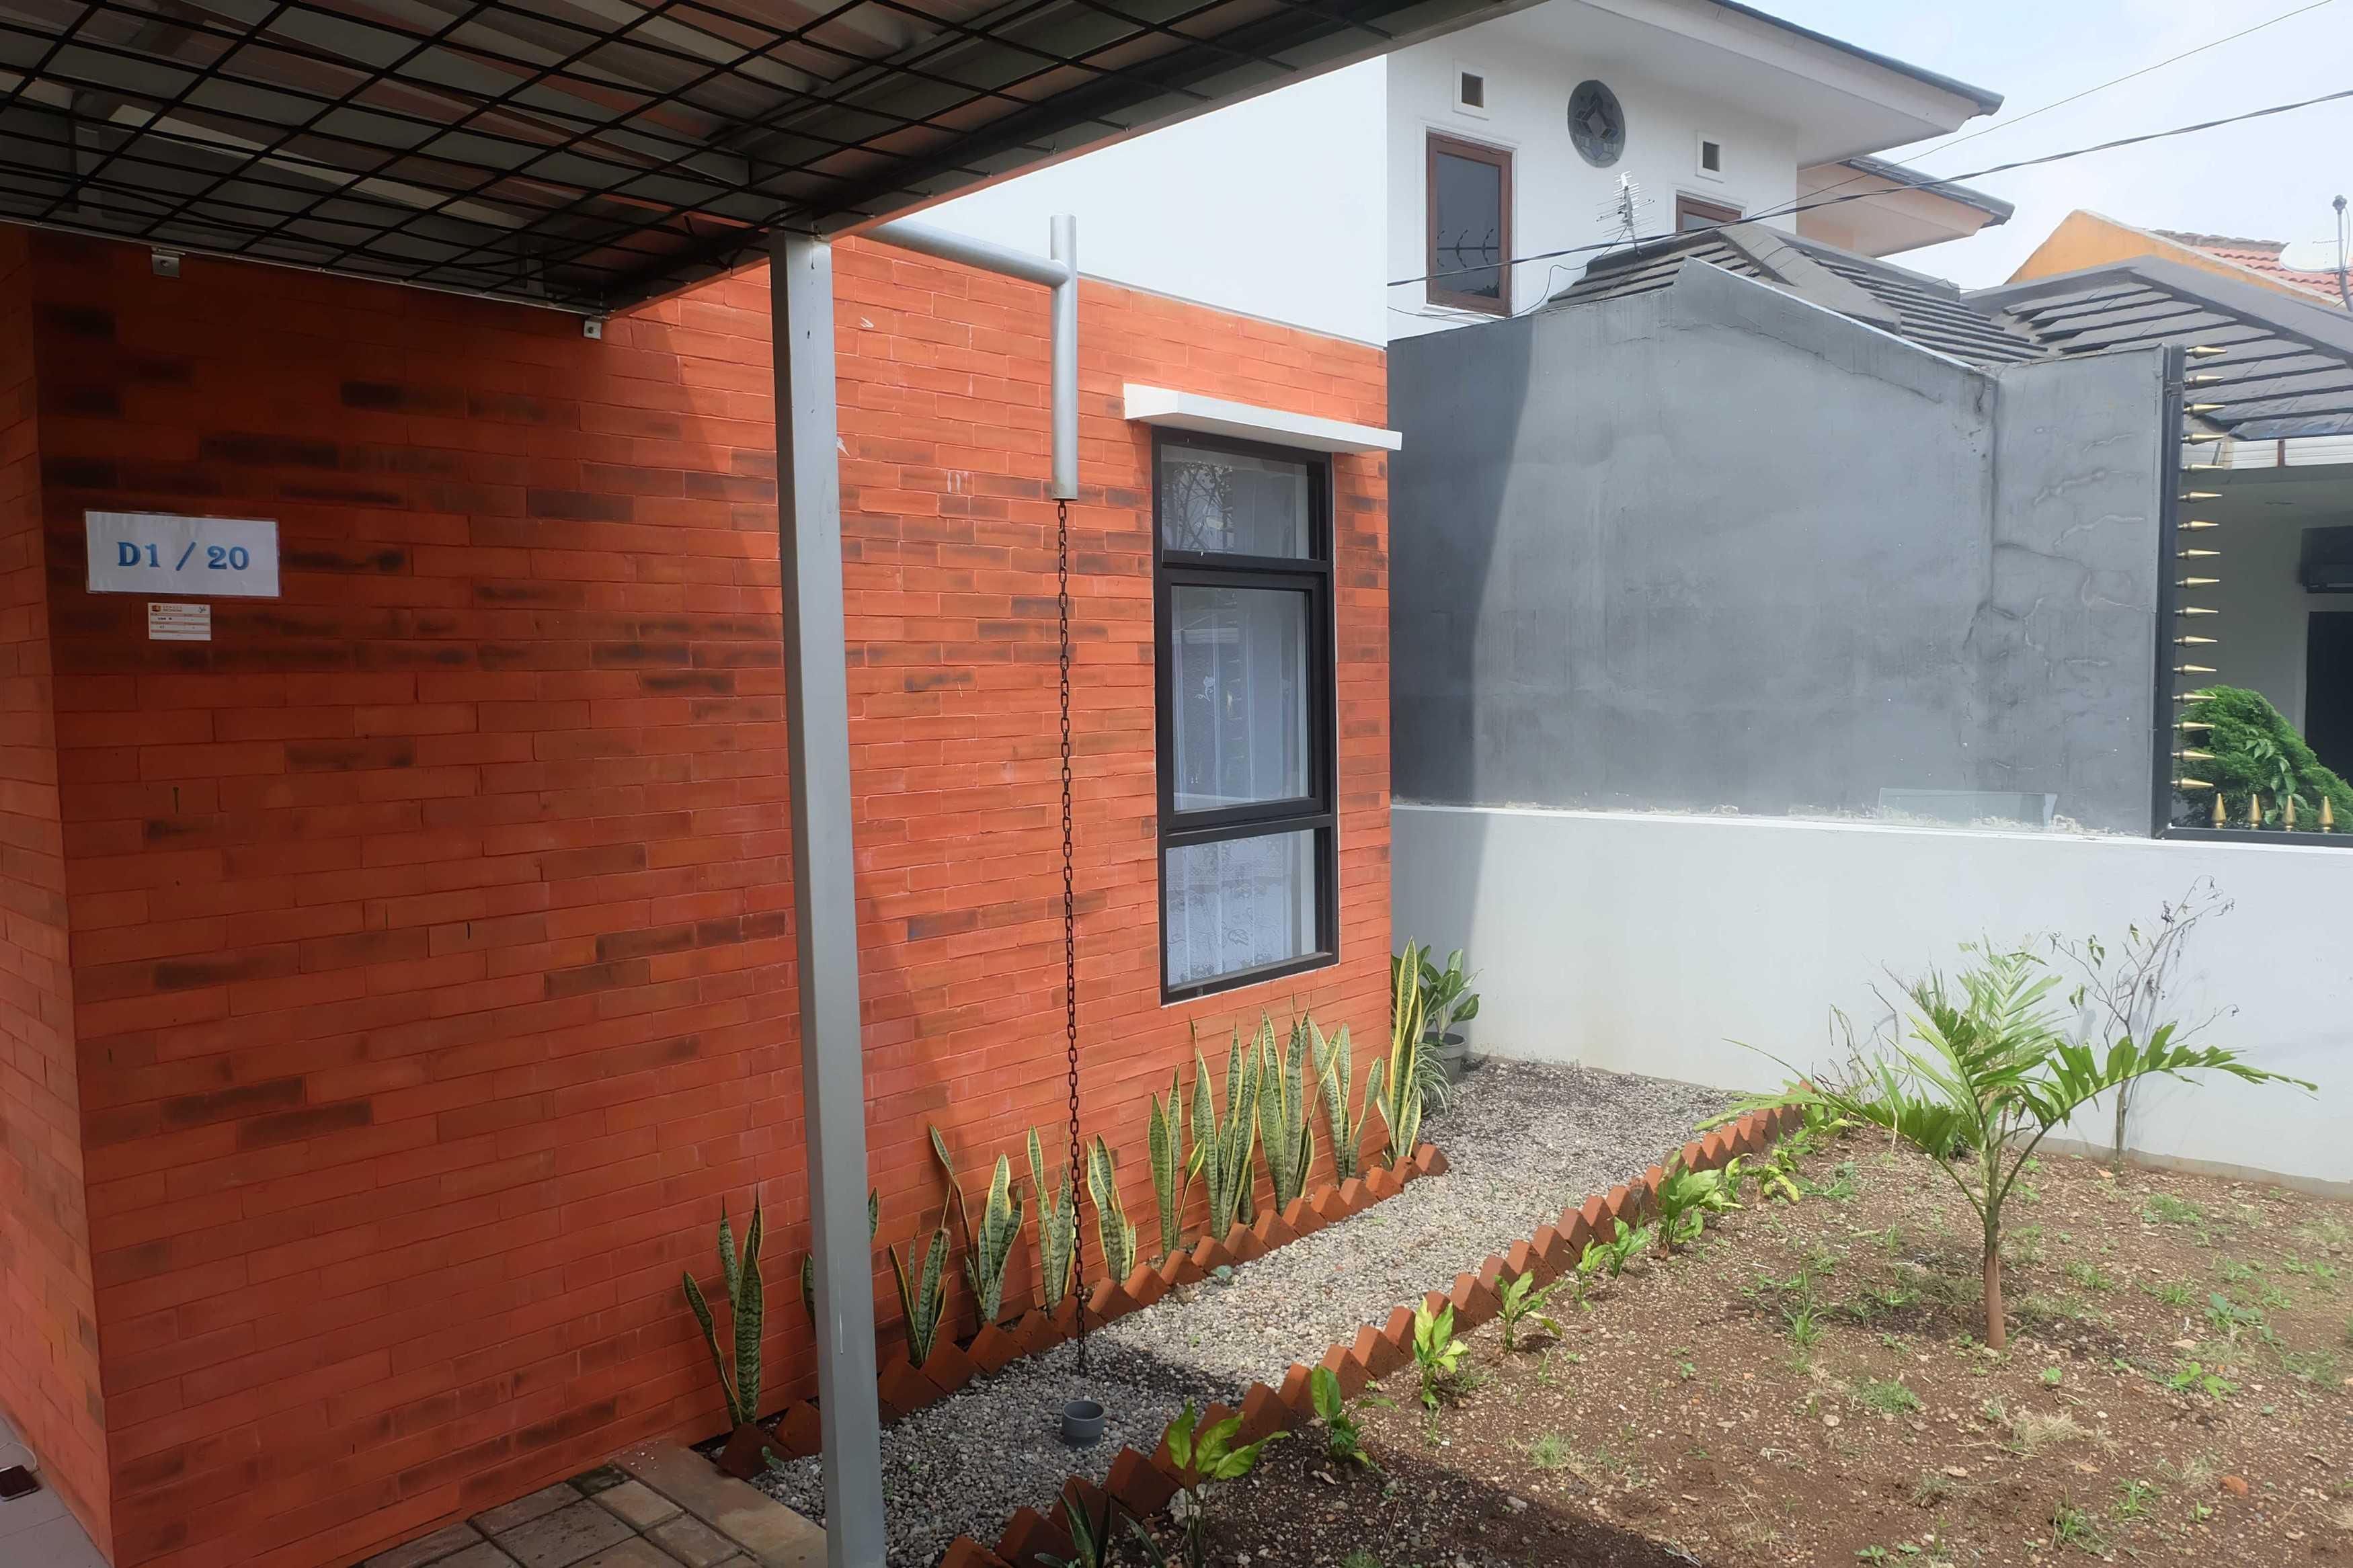 Aaksen Responsible Aarchitecture Rumah Pulang Cimahi, Jawa Barat Cimahi, Jawa Barat Dscf5809   47681